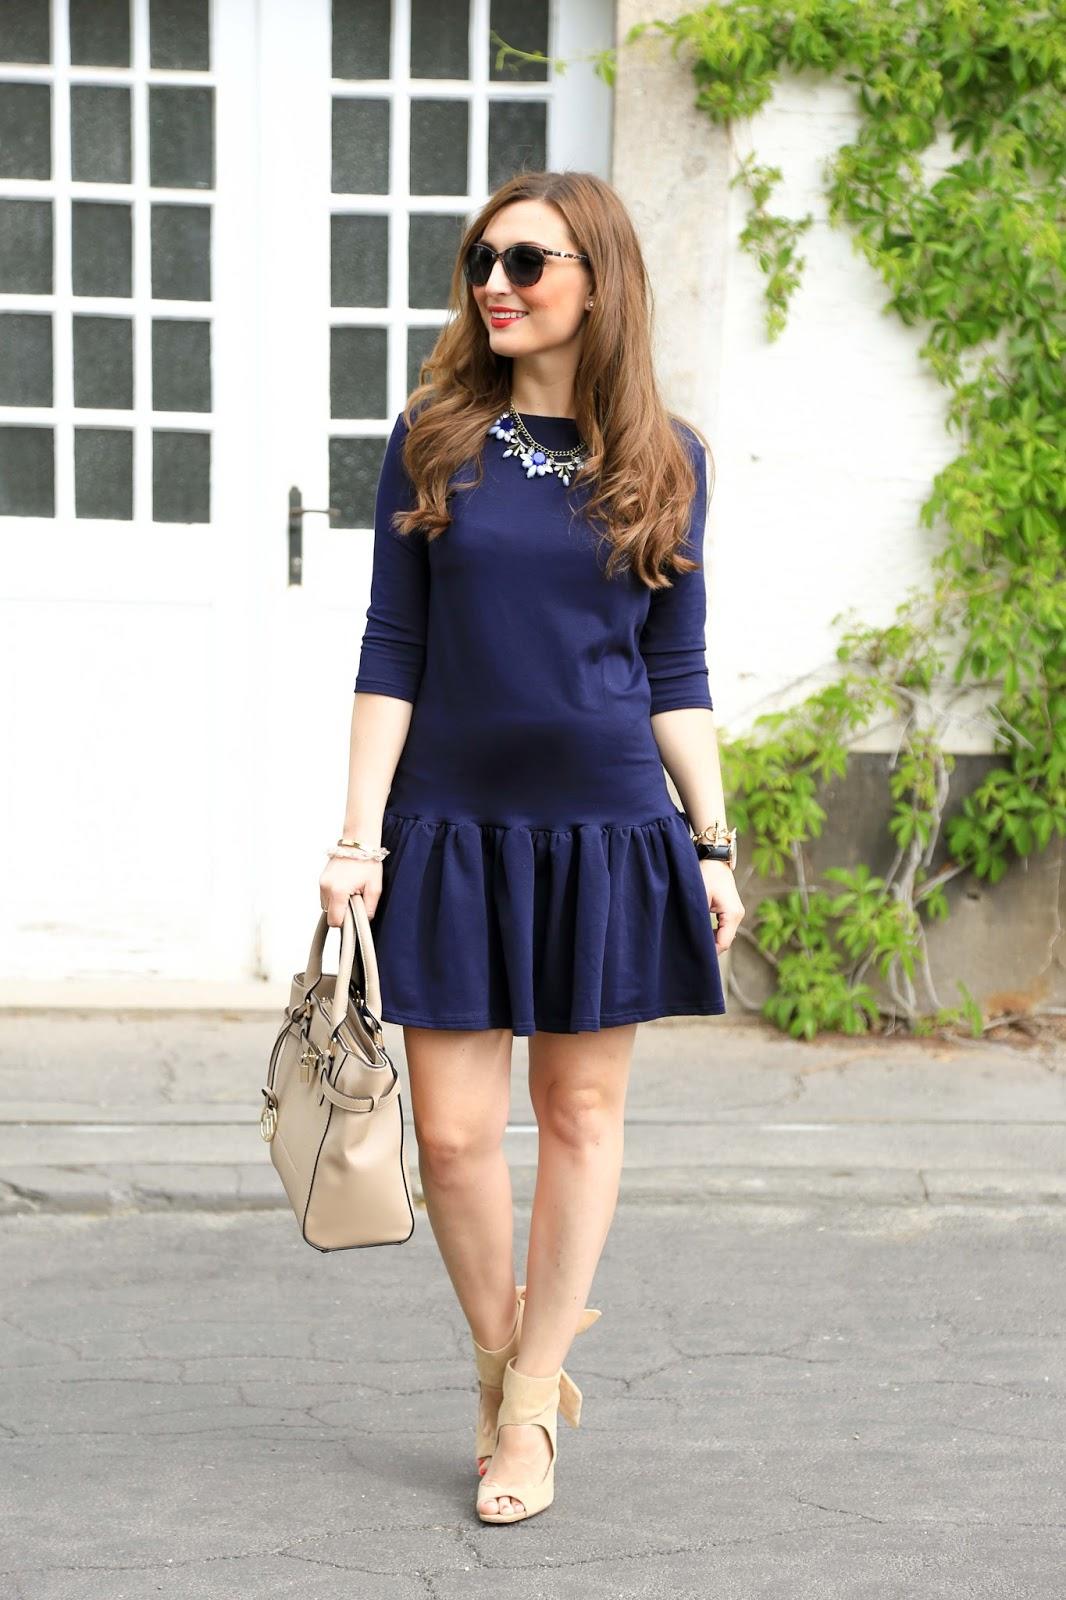 Blogger aus Frankfurt - Fashionstylebyjohanna im Kleid 2